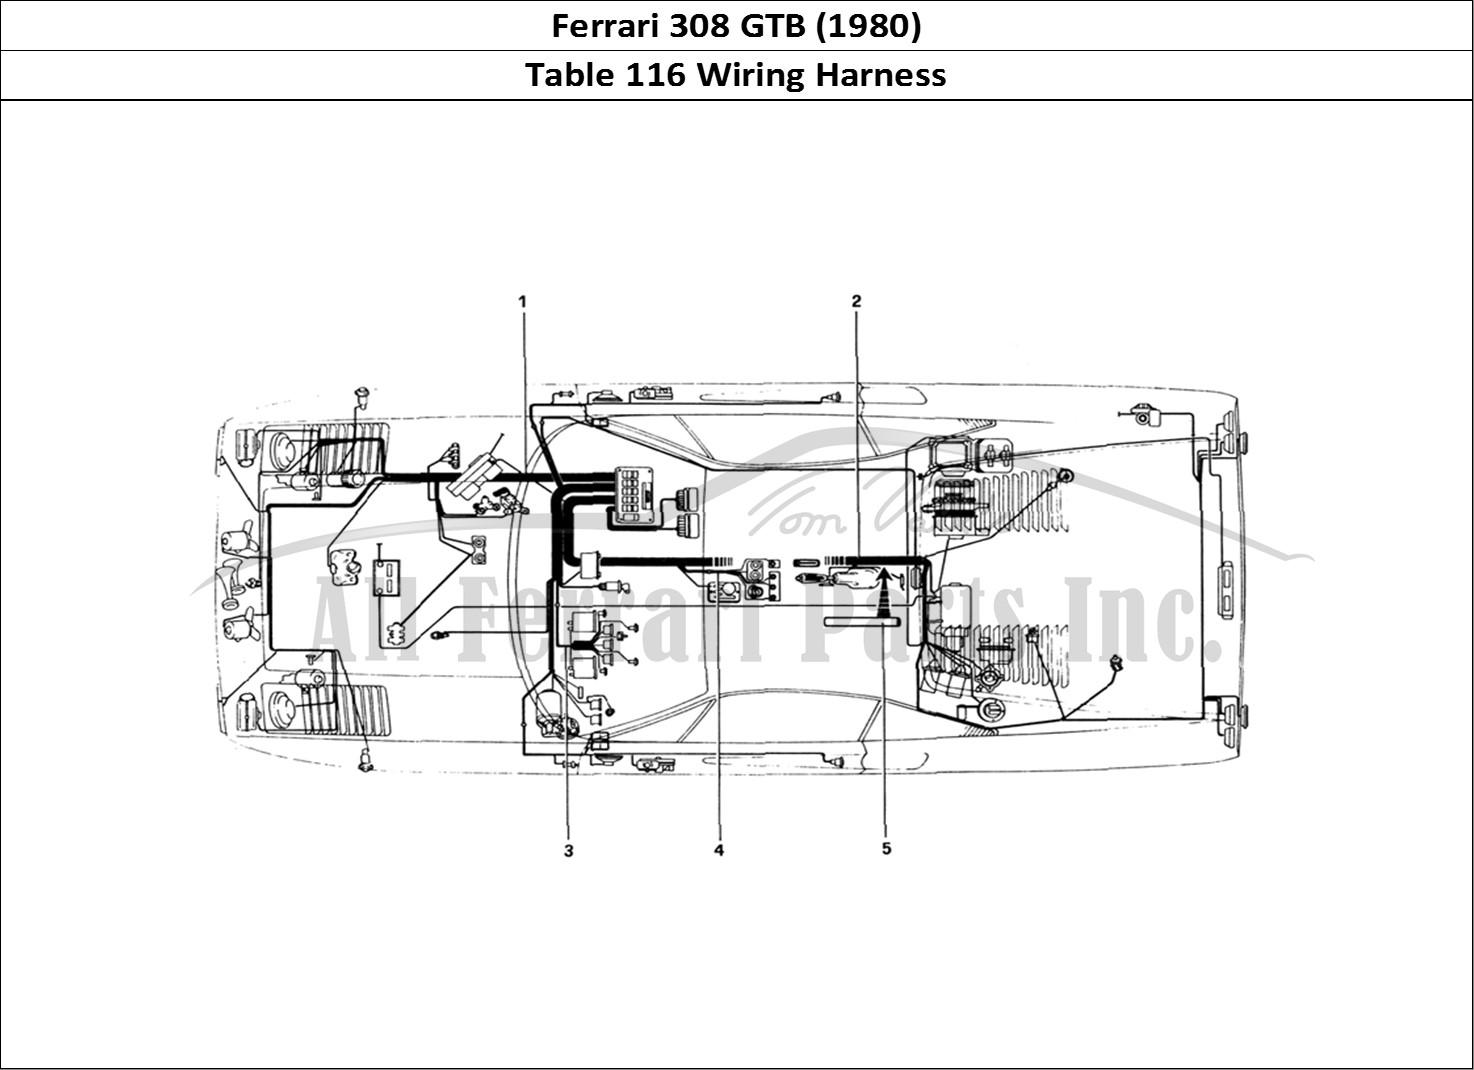 buy original ferrari 308 gtb  1980  116 wiring harness